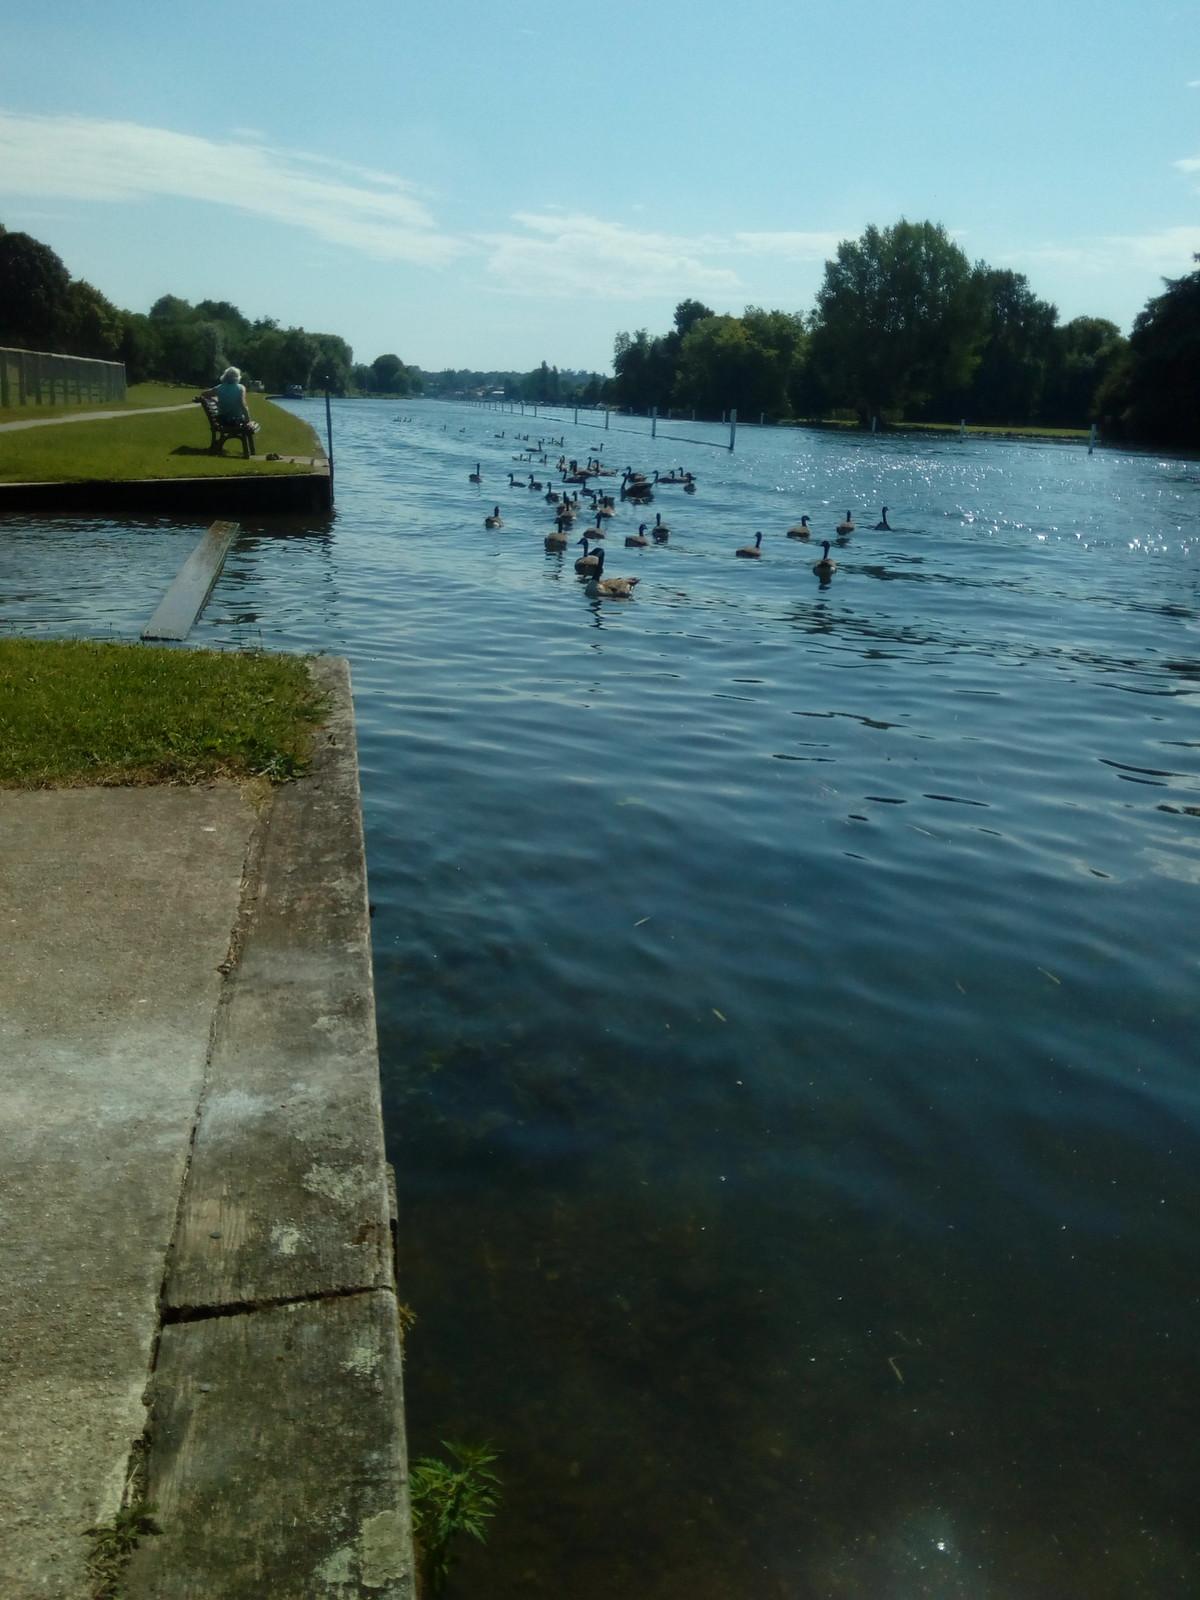 Canadian Geese regatta